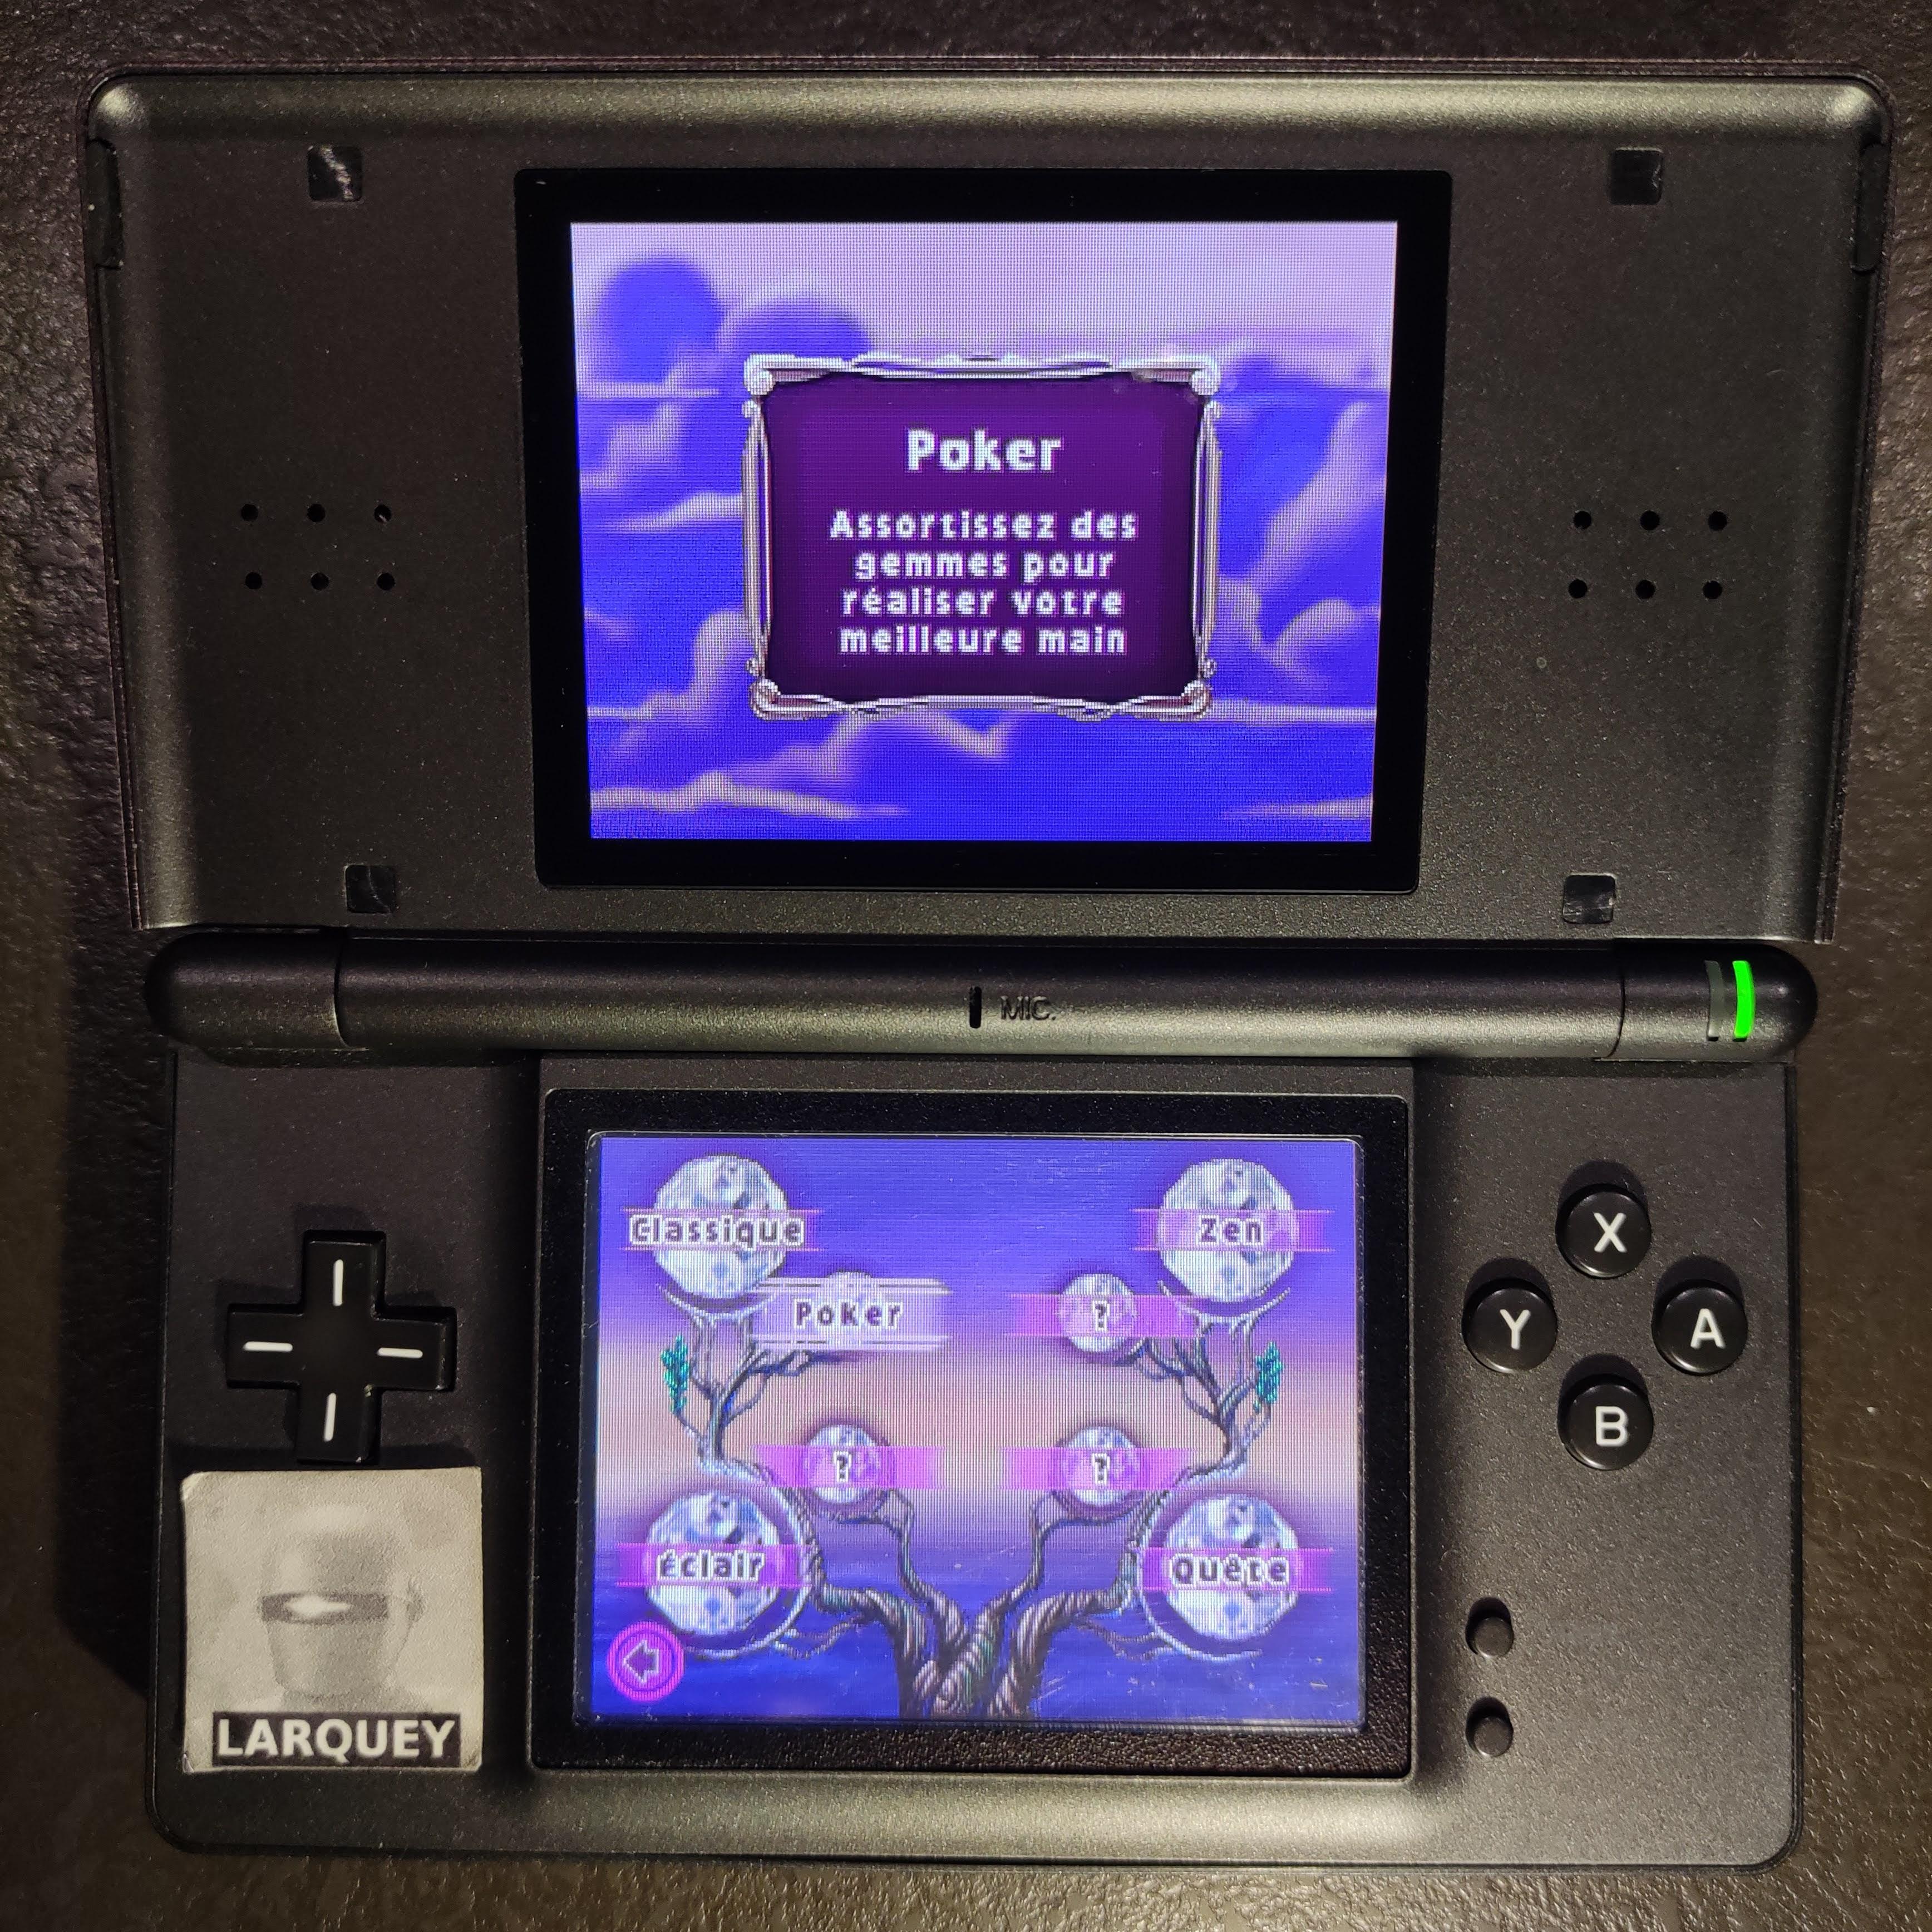 Larquey: Bejeweled 3: Poker [High Score] (Nintendo DS) 78,650 points on 2020-09-26 03:53:44